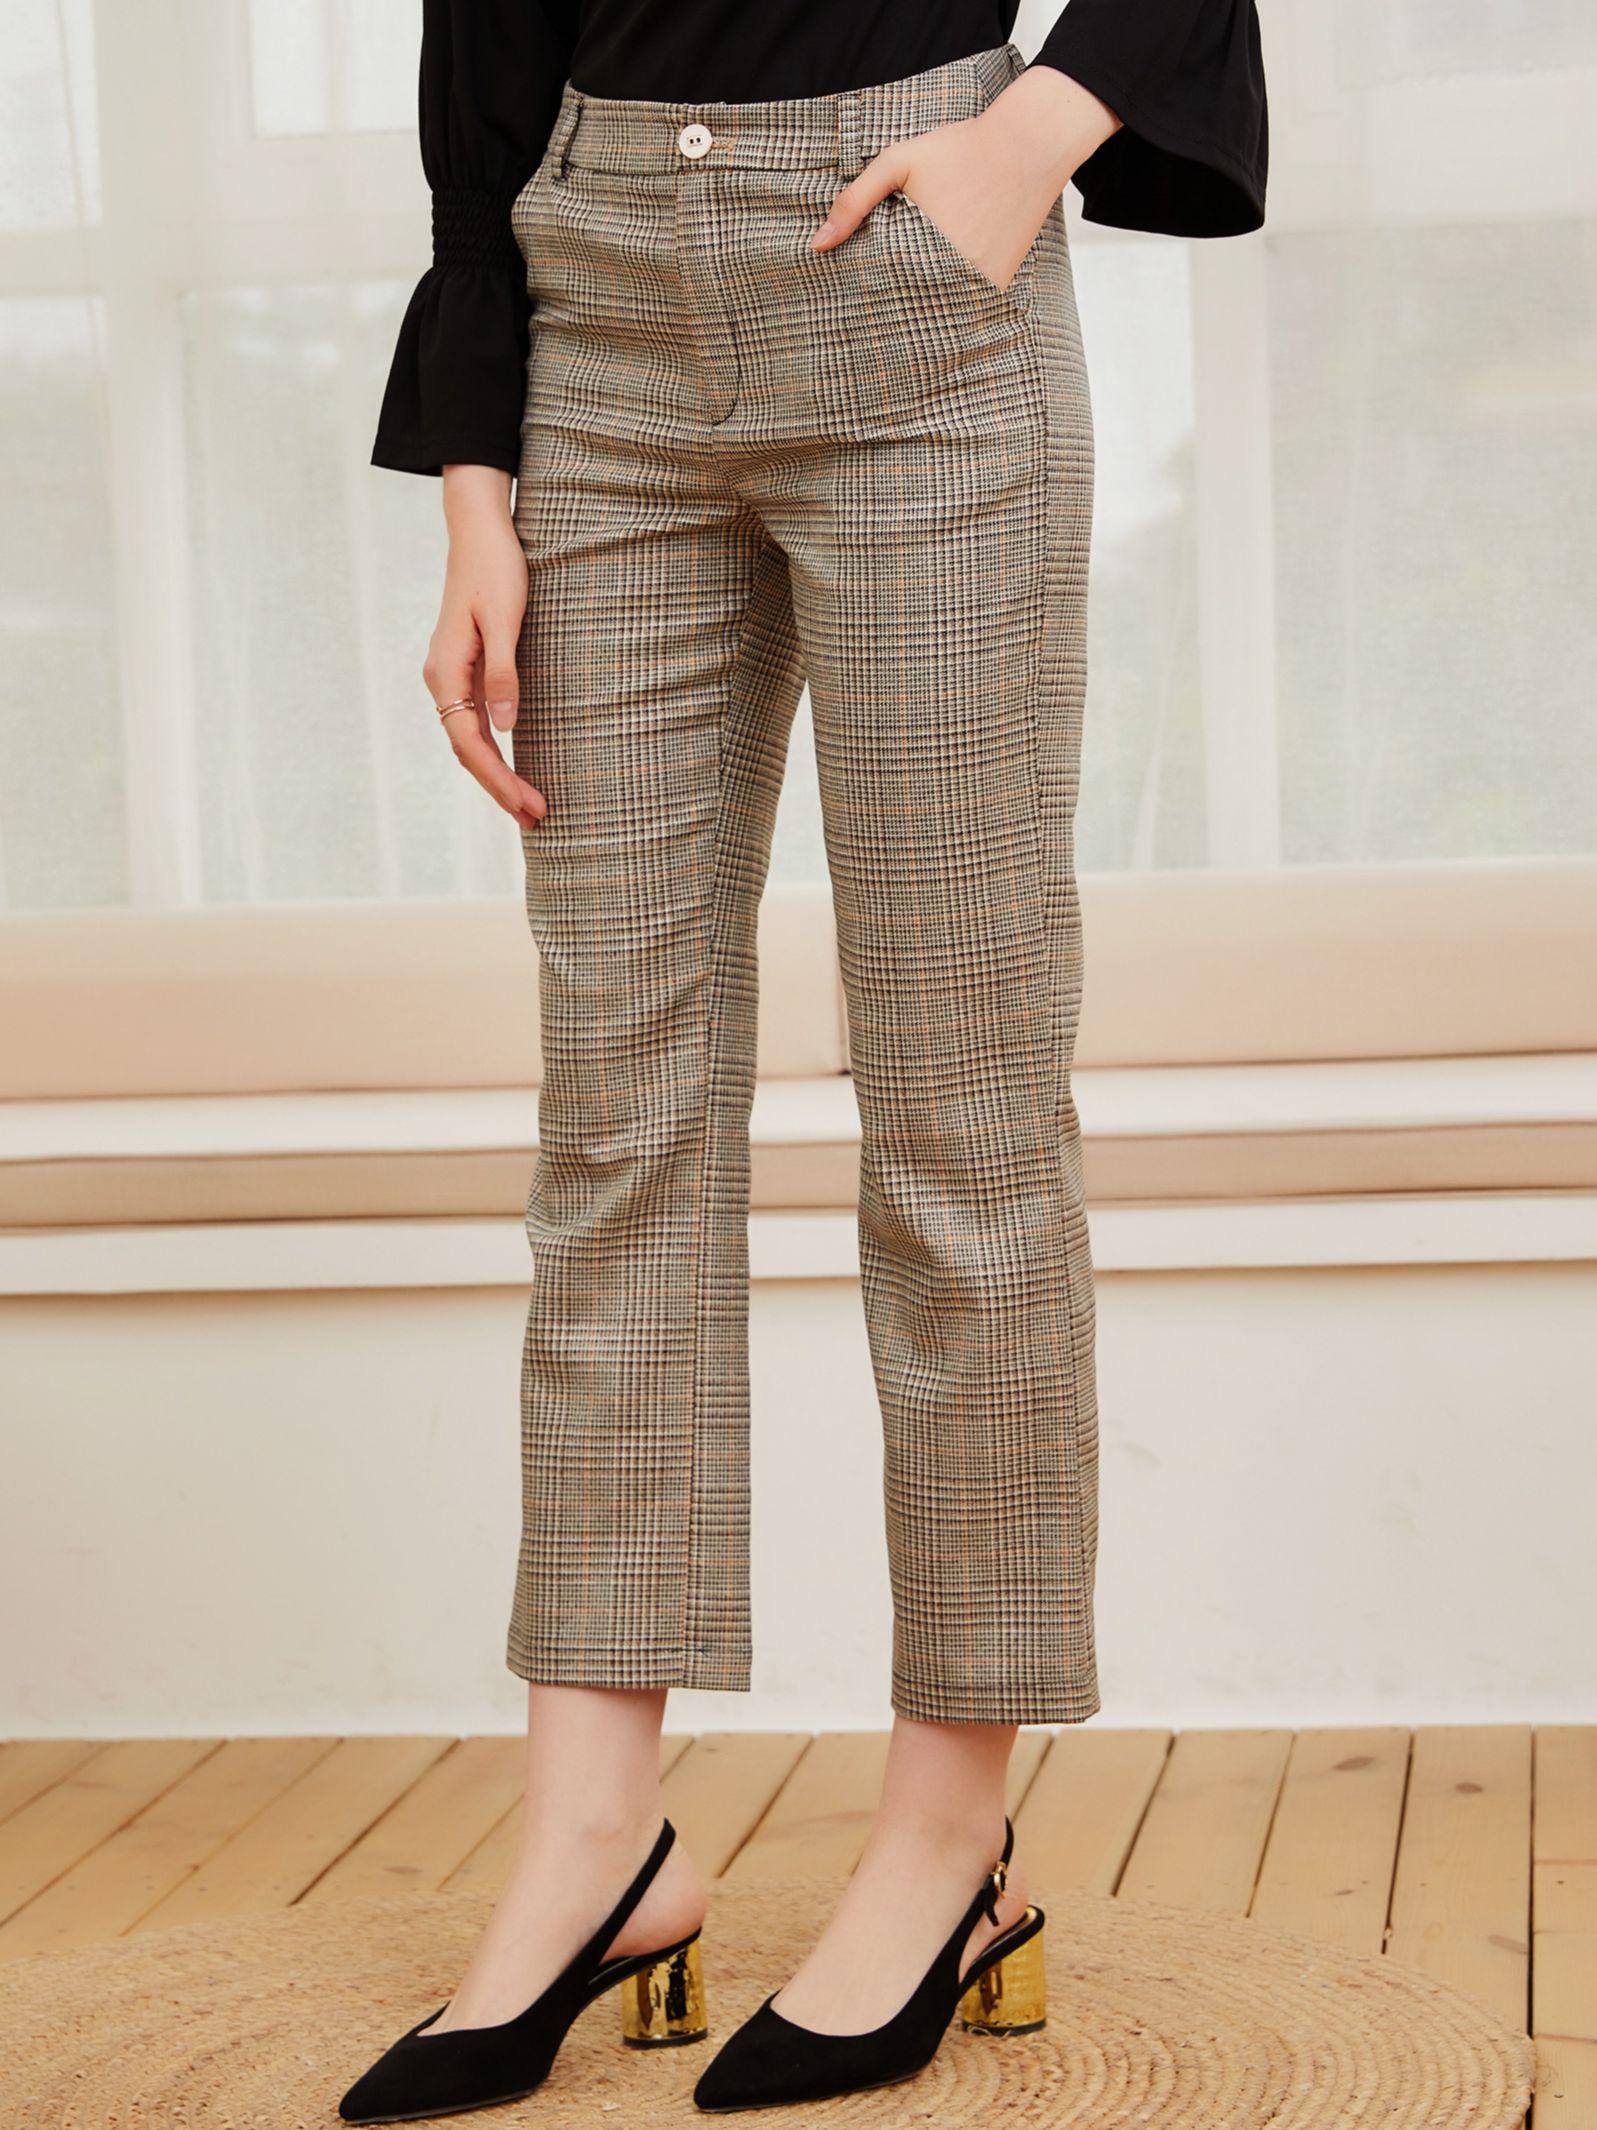 2021 spring and autumn new temperament color lattice women's long pants comfortable straight pants c